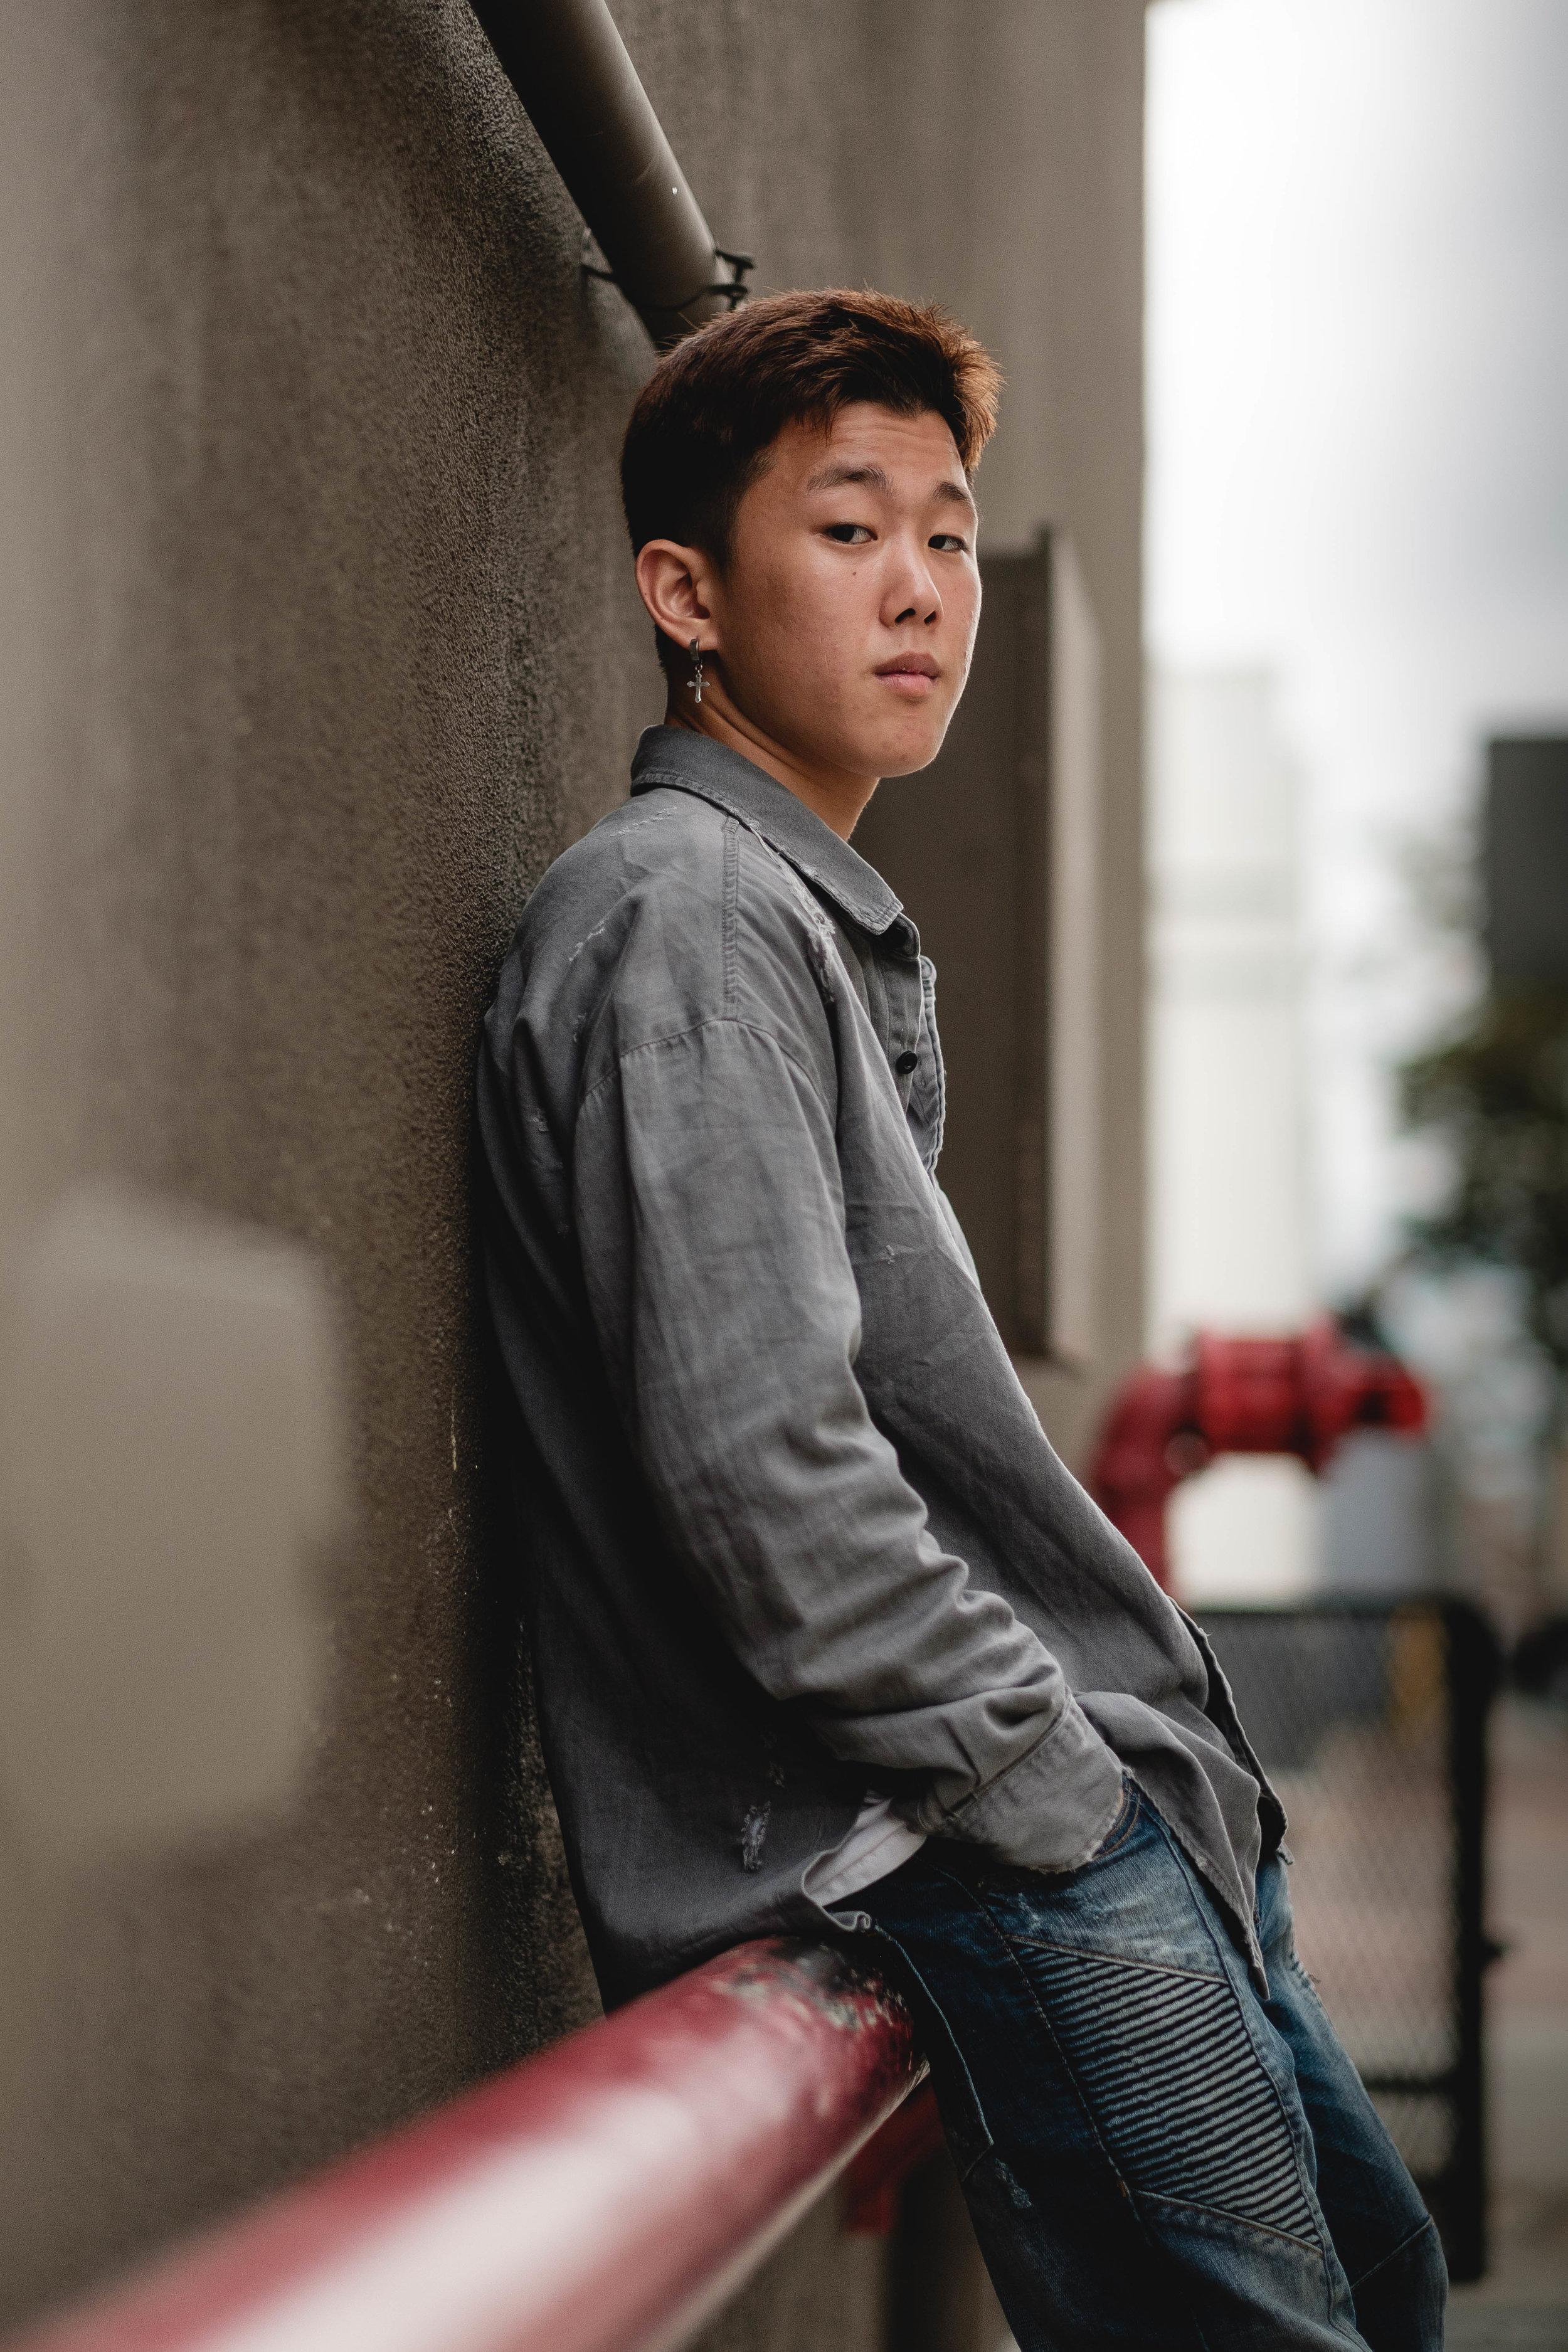 Fullerton Street Portrait Photo shoot